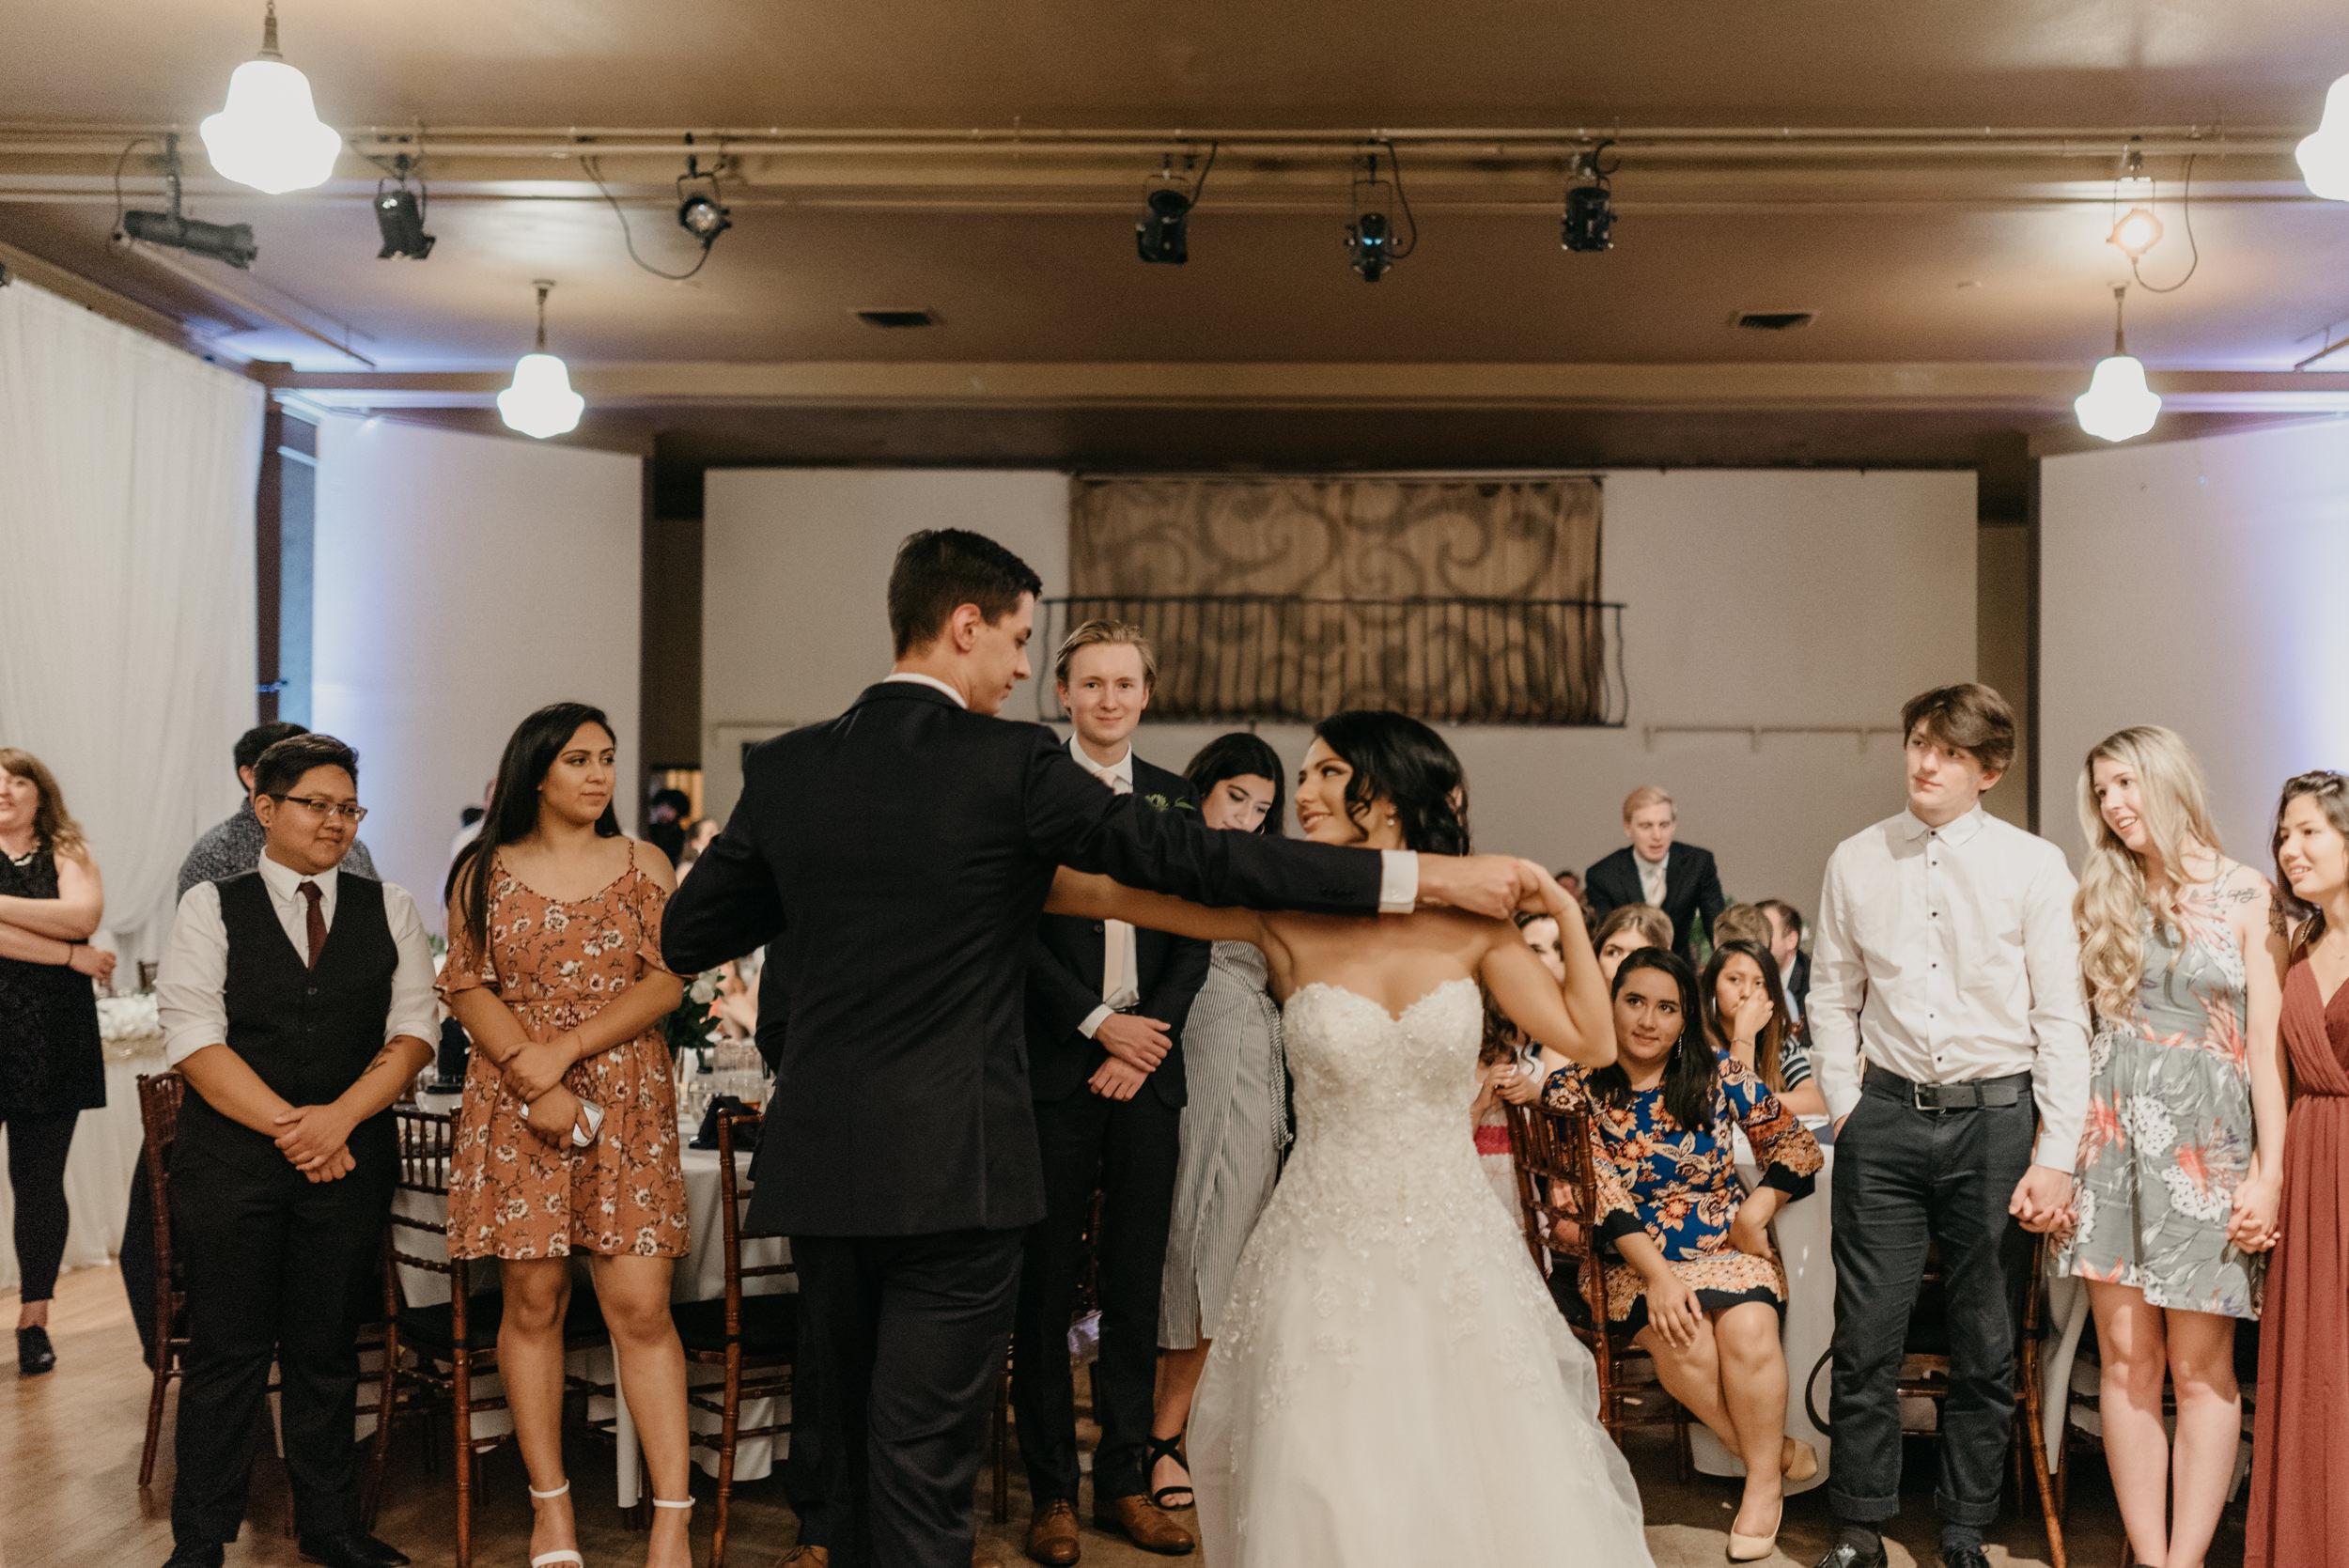 120-reception-west-end-ballroom-portland-wedding-photographer-8694.jpg